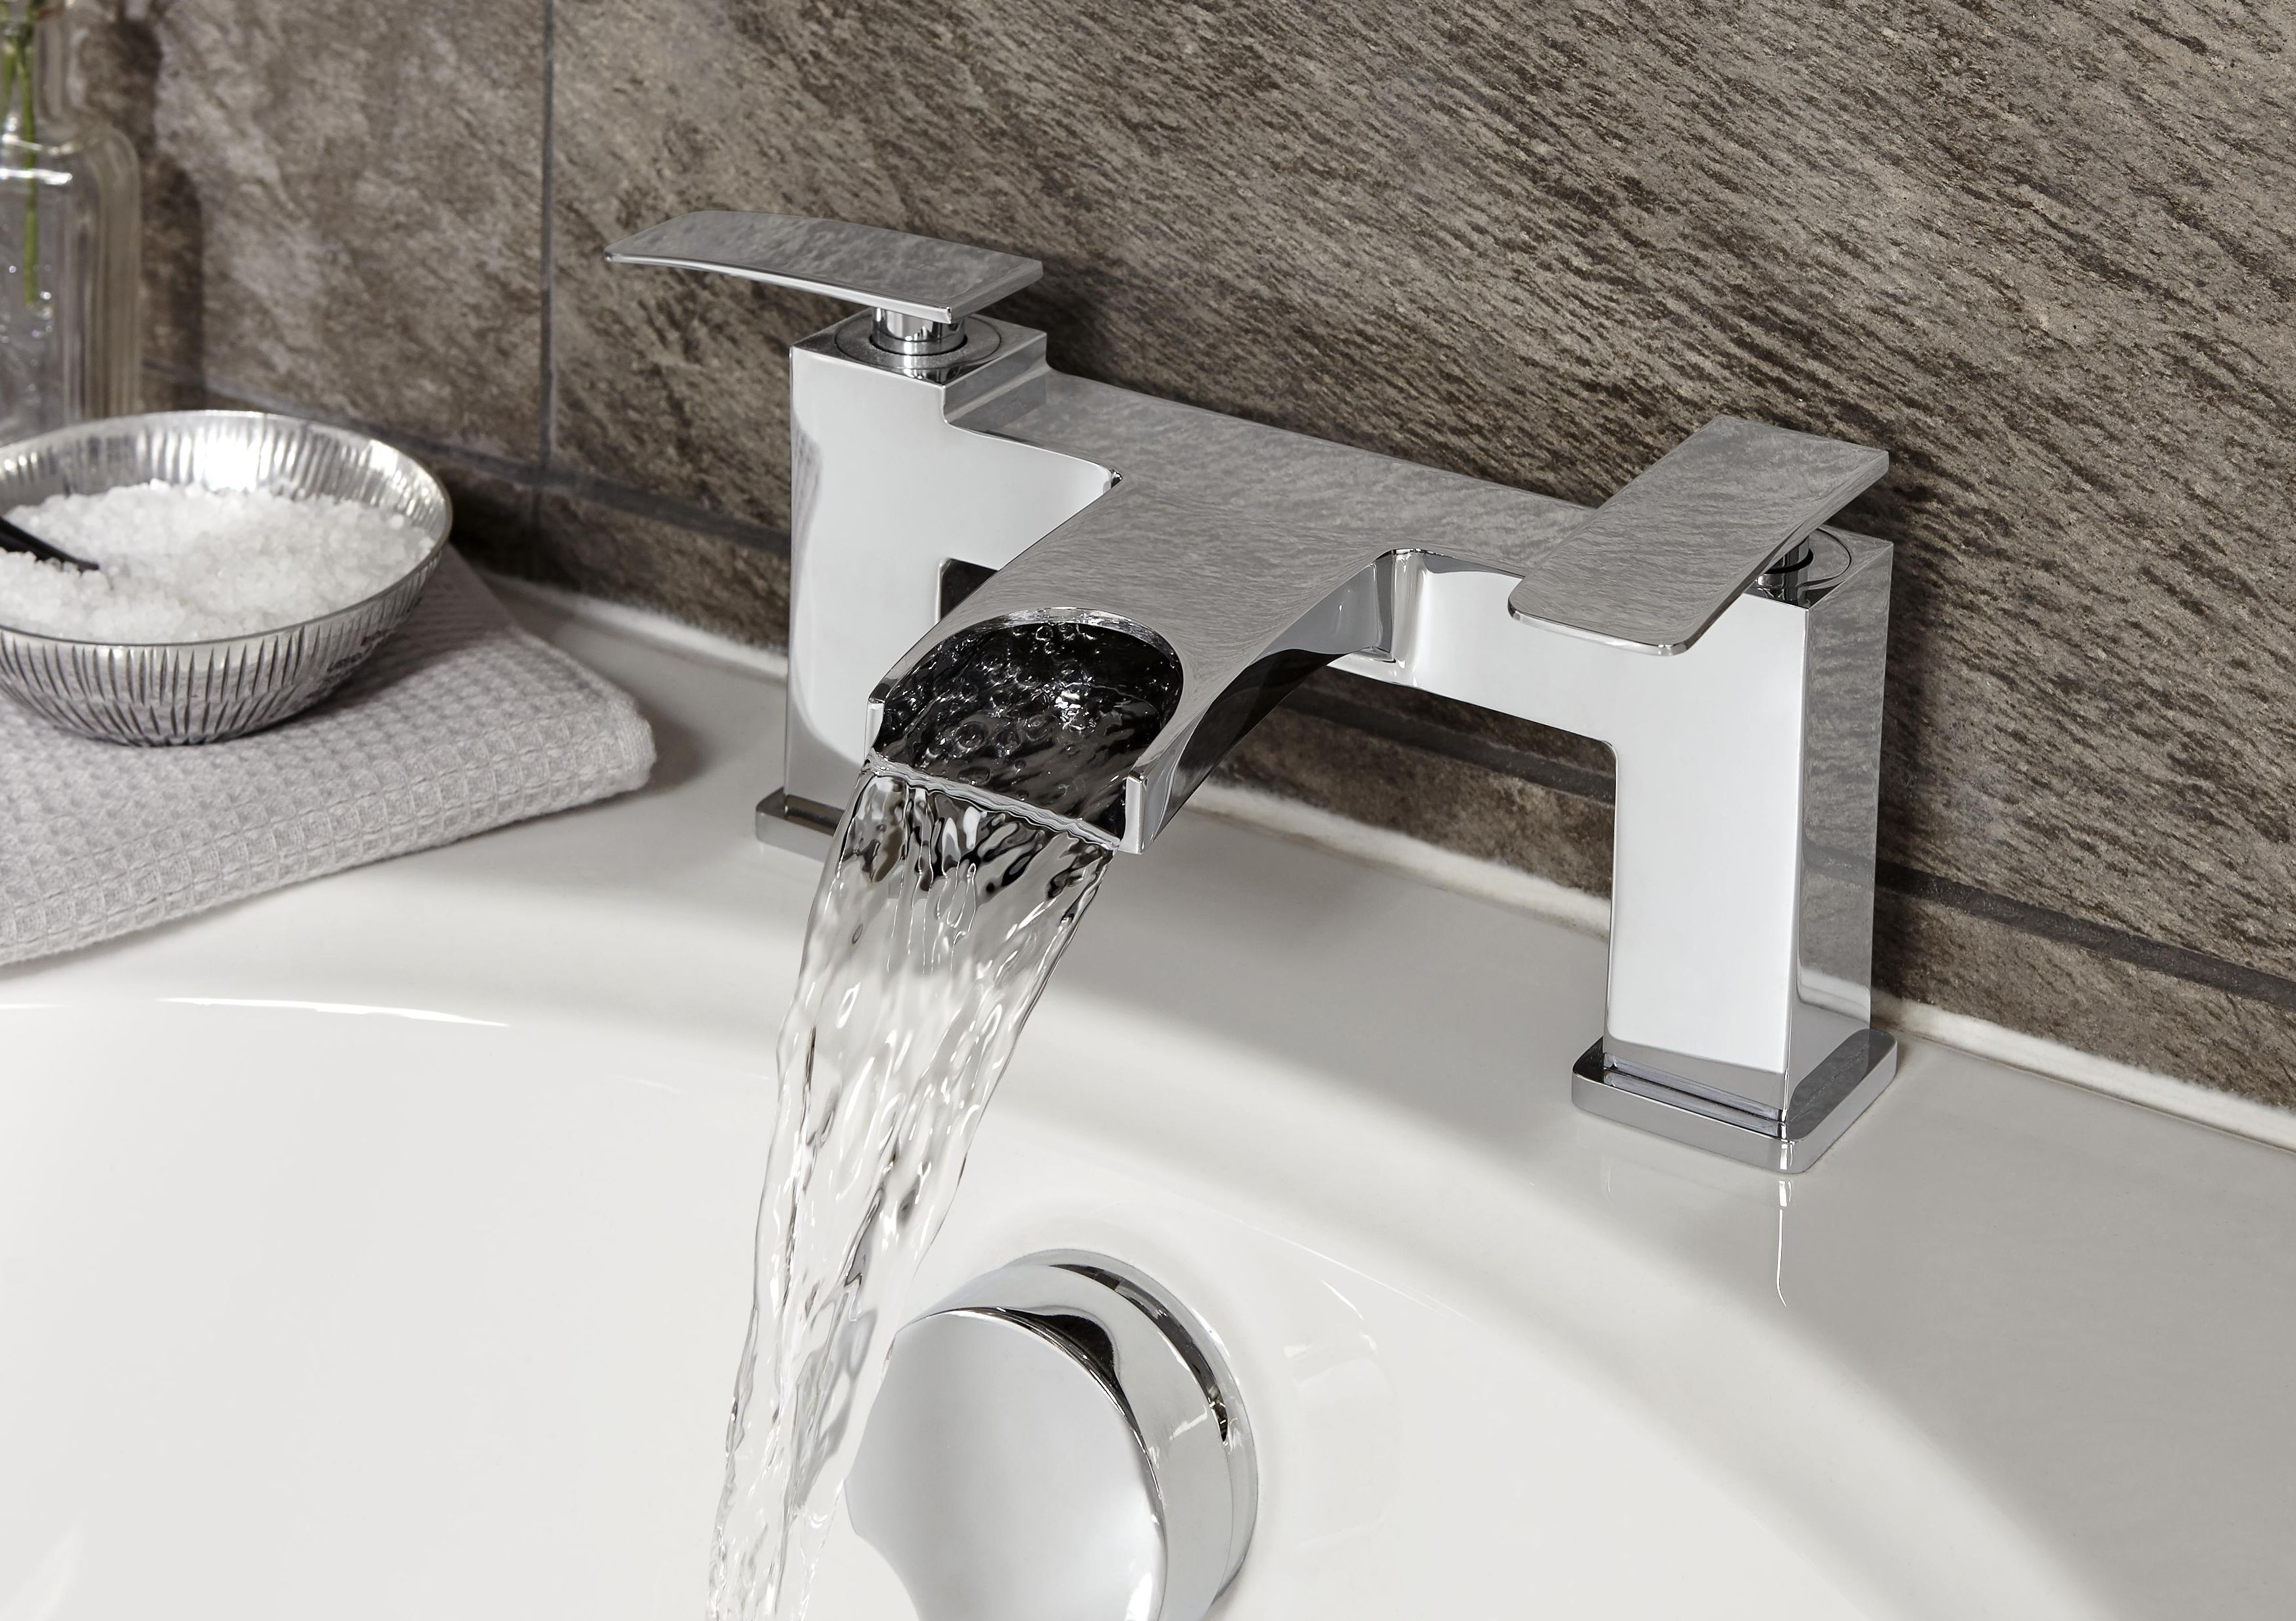 Bathroom Sinks Limerick bathrooms | bathroom fittings & accessories | diy at b&q